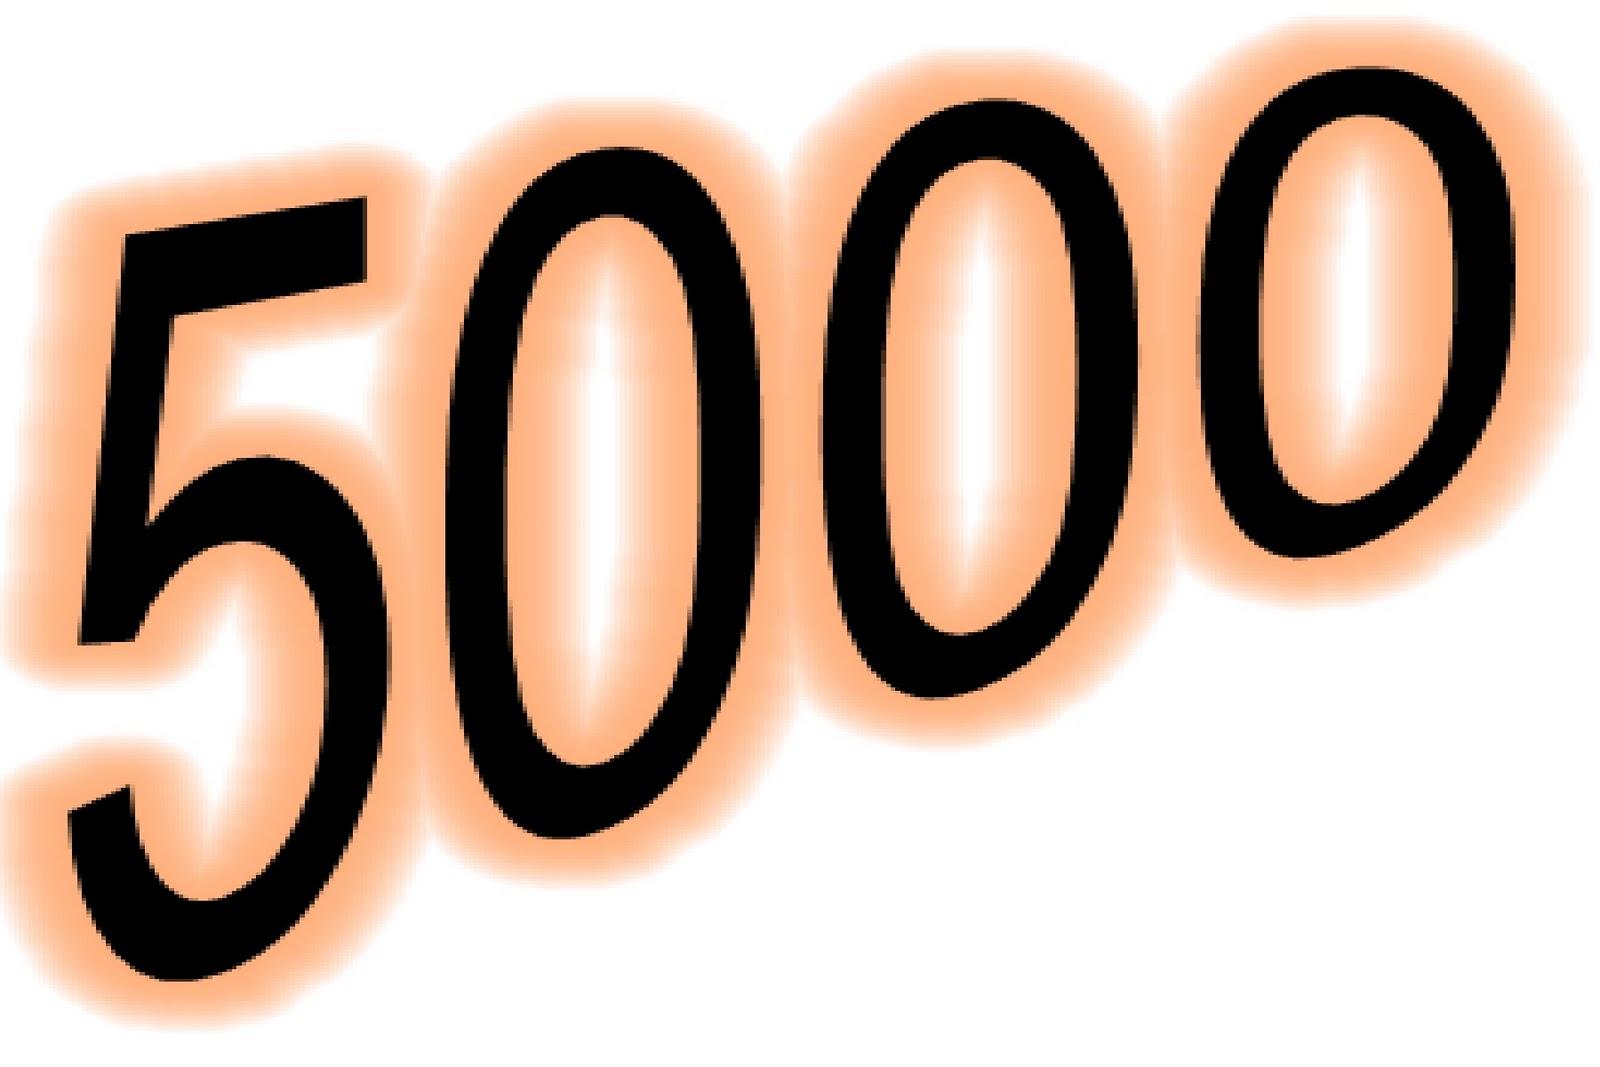 5,000 €